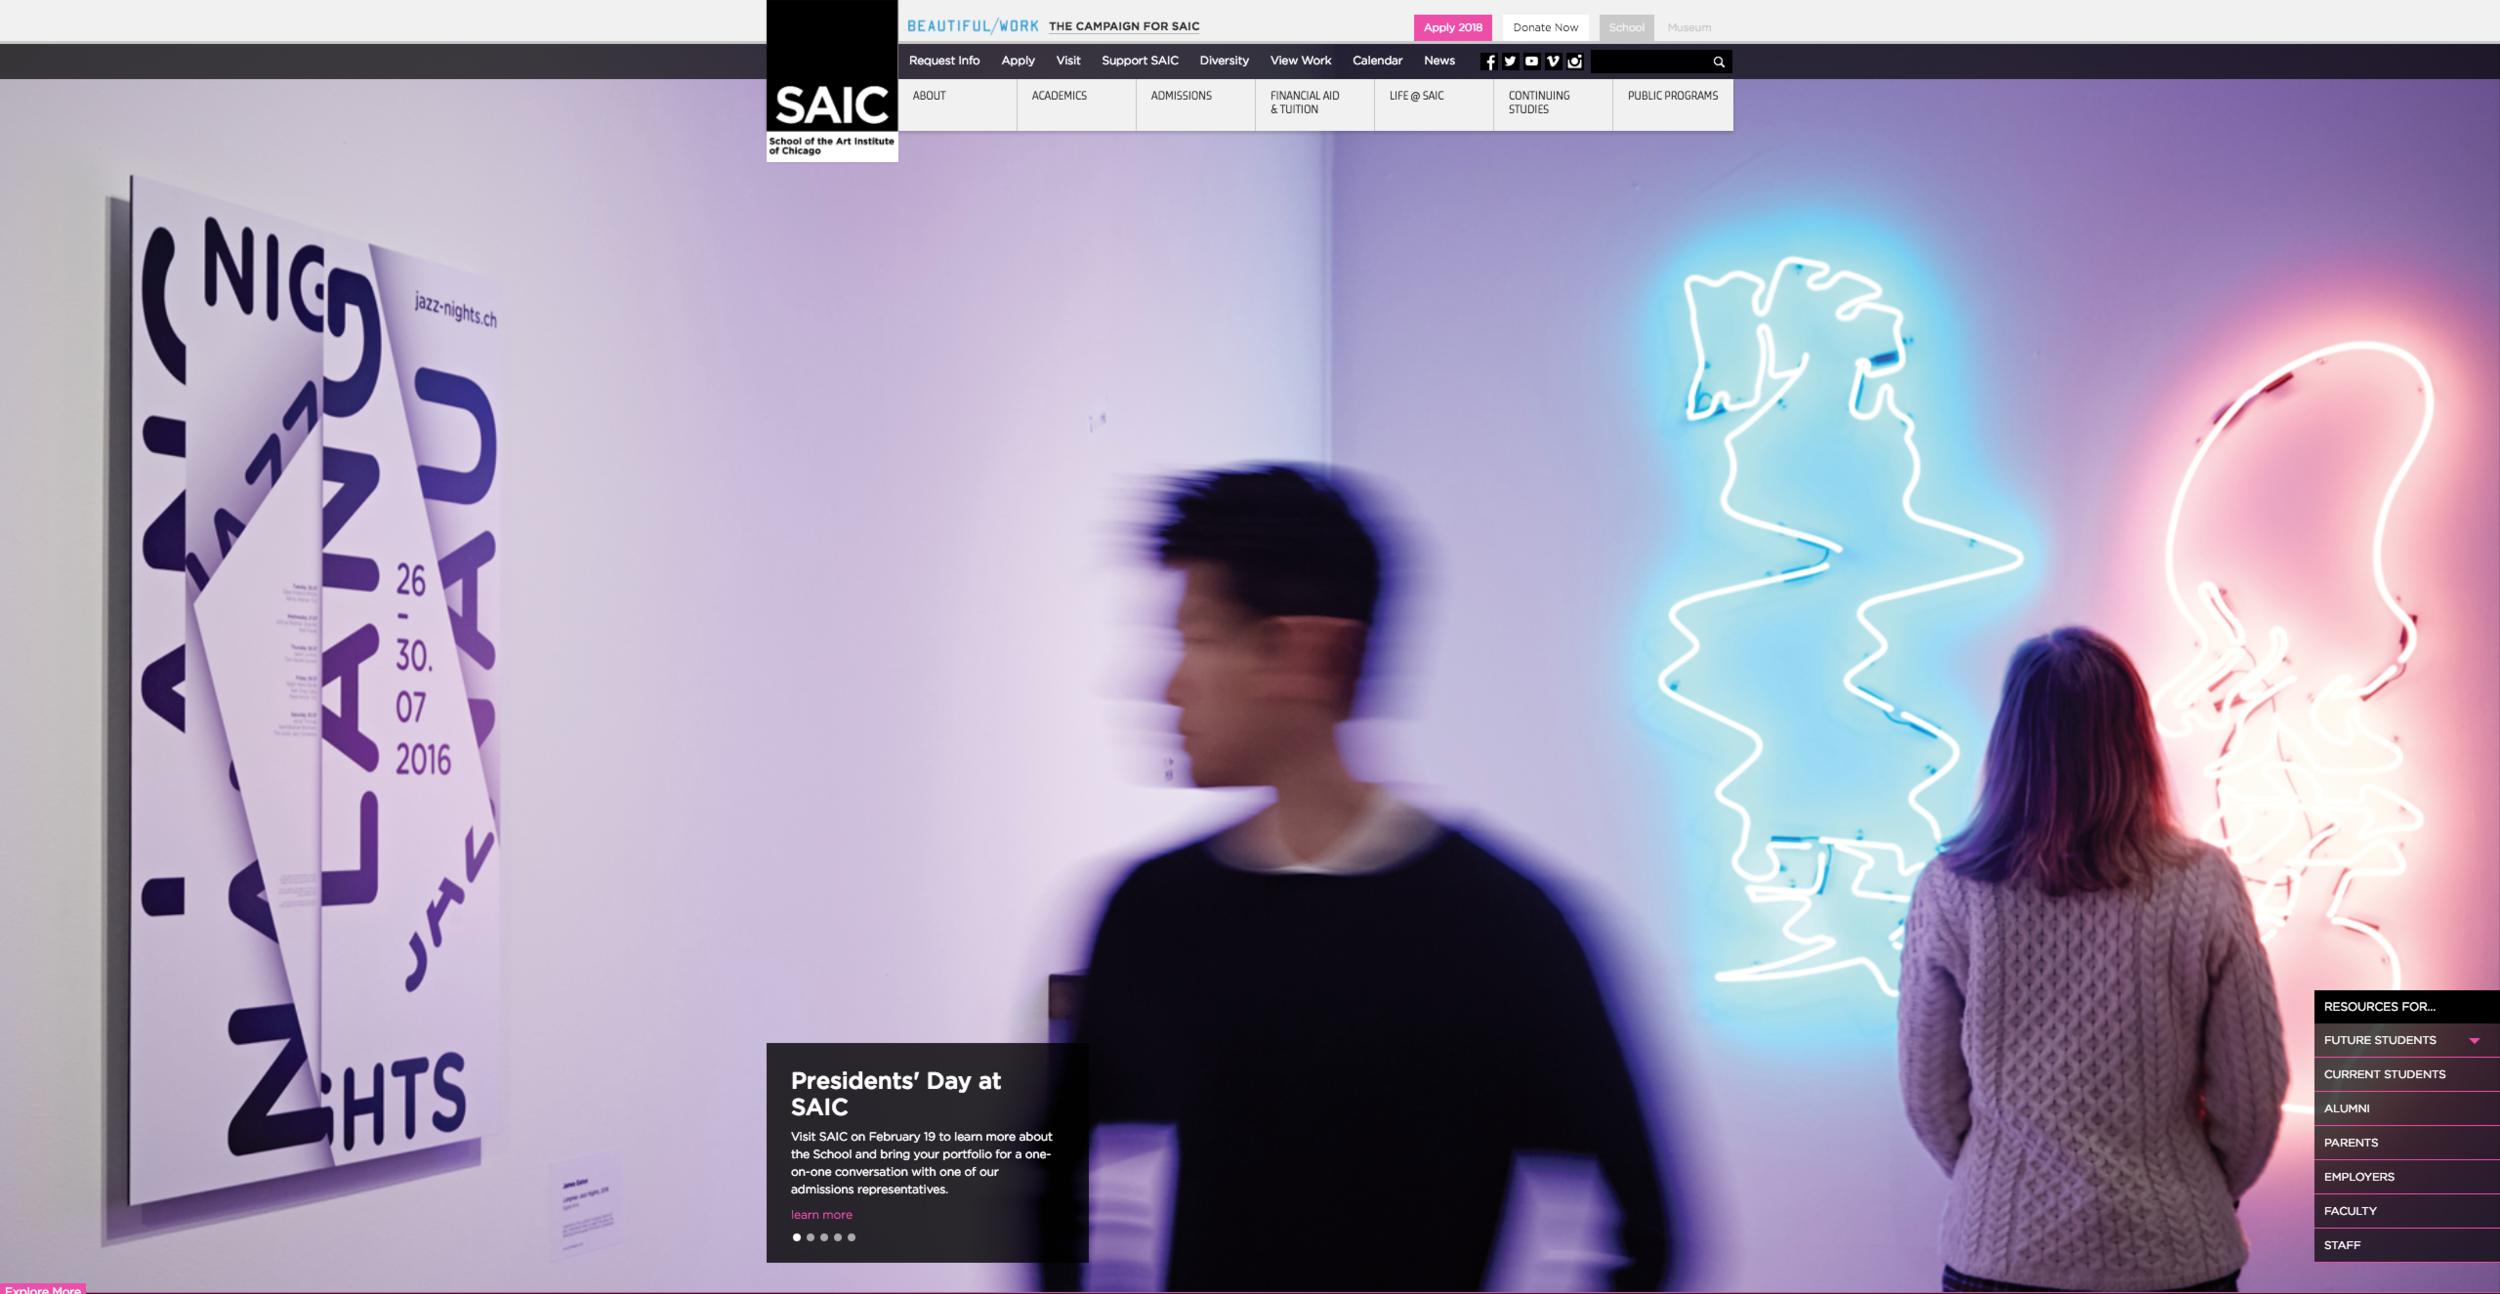 Featured in School of Art Institute of Design homepage